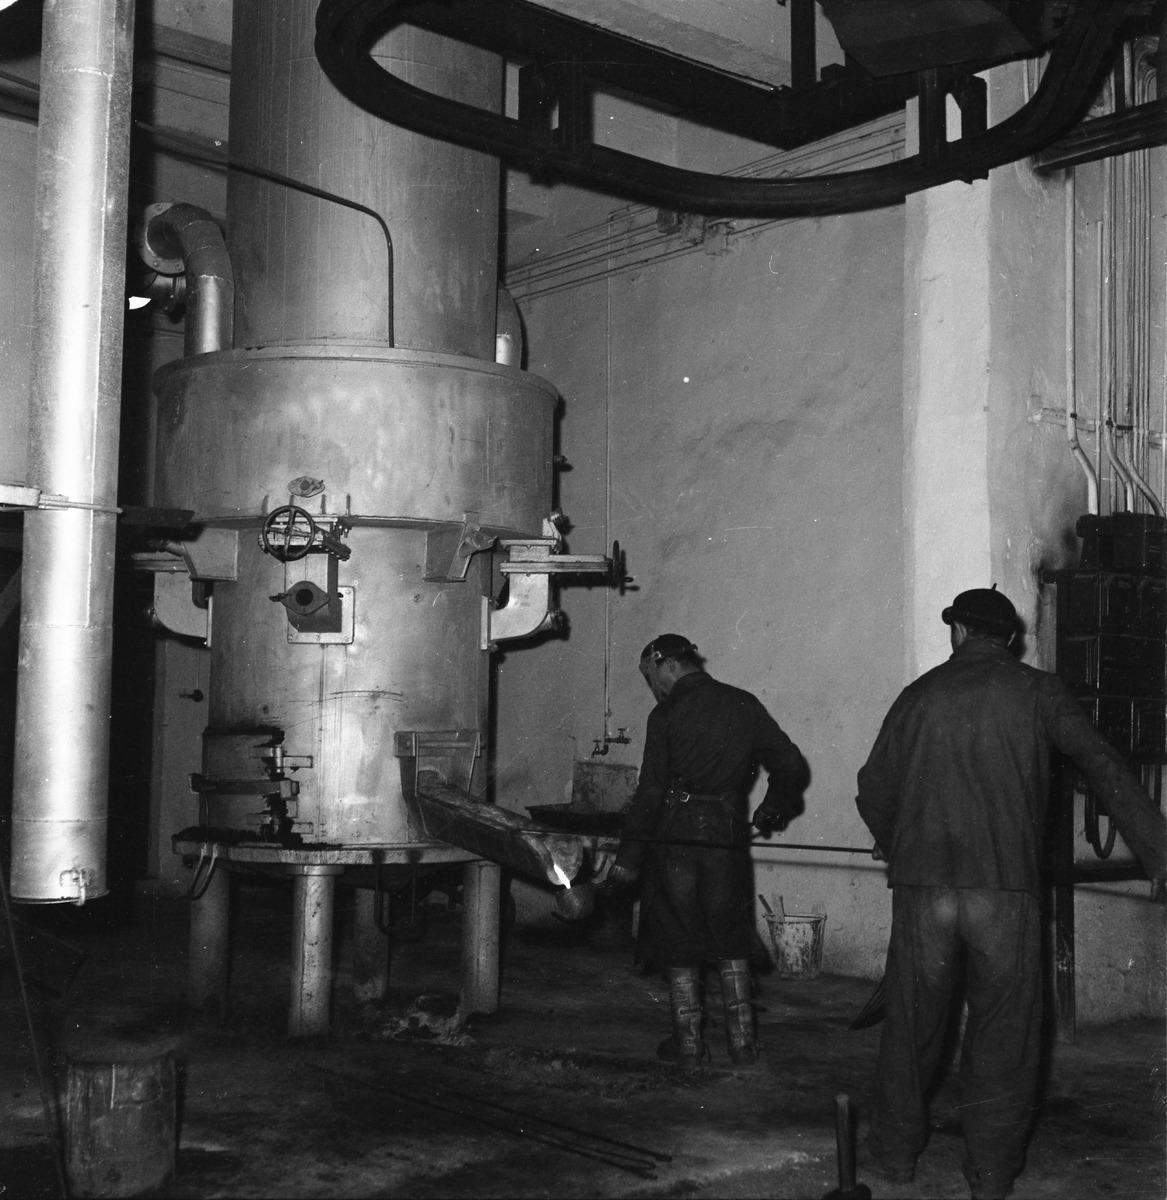 Pracownicy A-23 w Wilkasach [9]